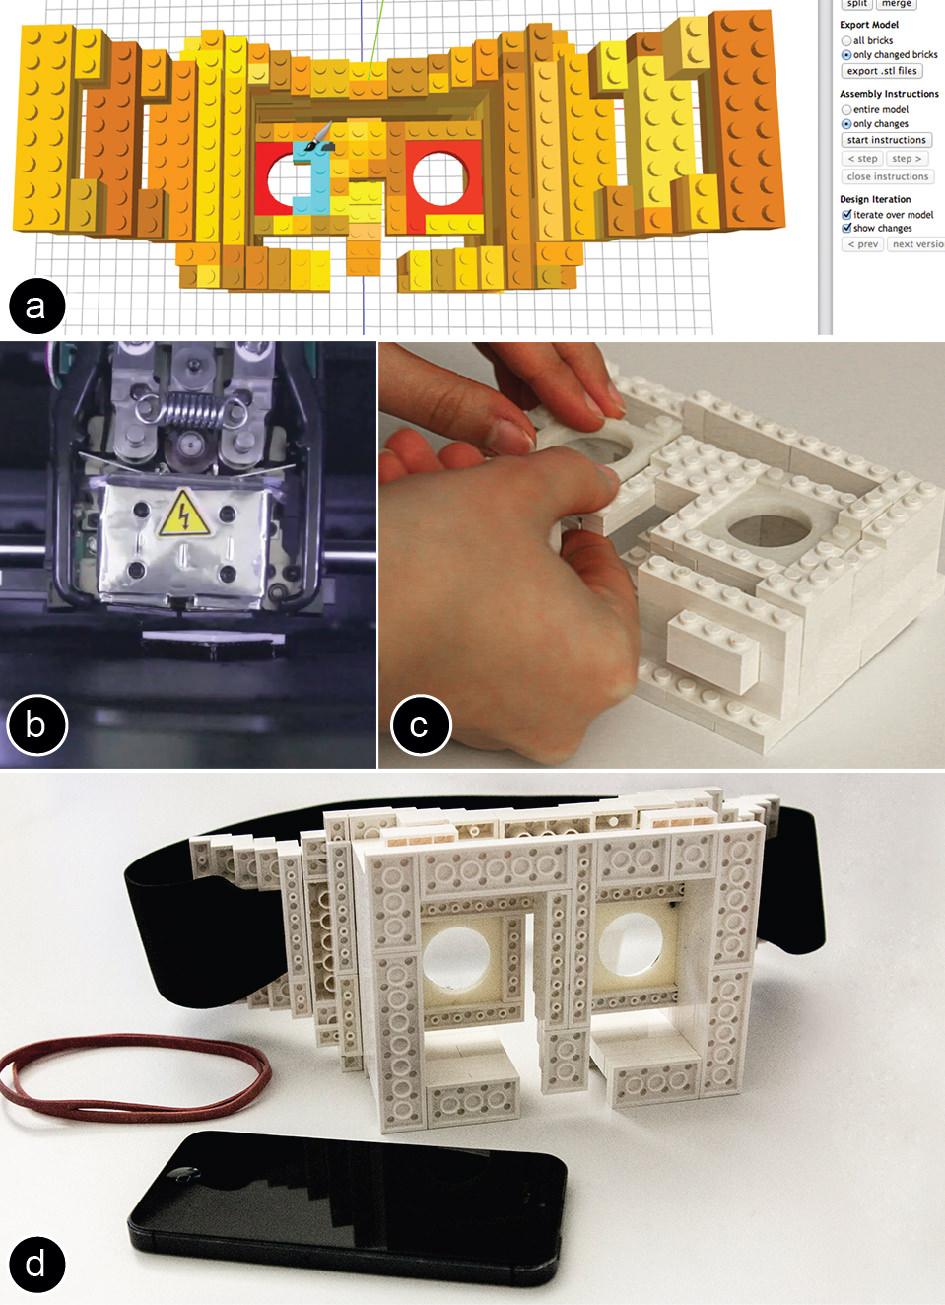 faBrickation-head-mounted-display - DIY 3d printers